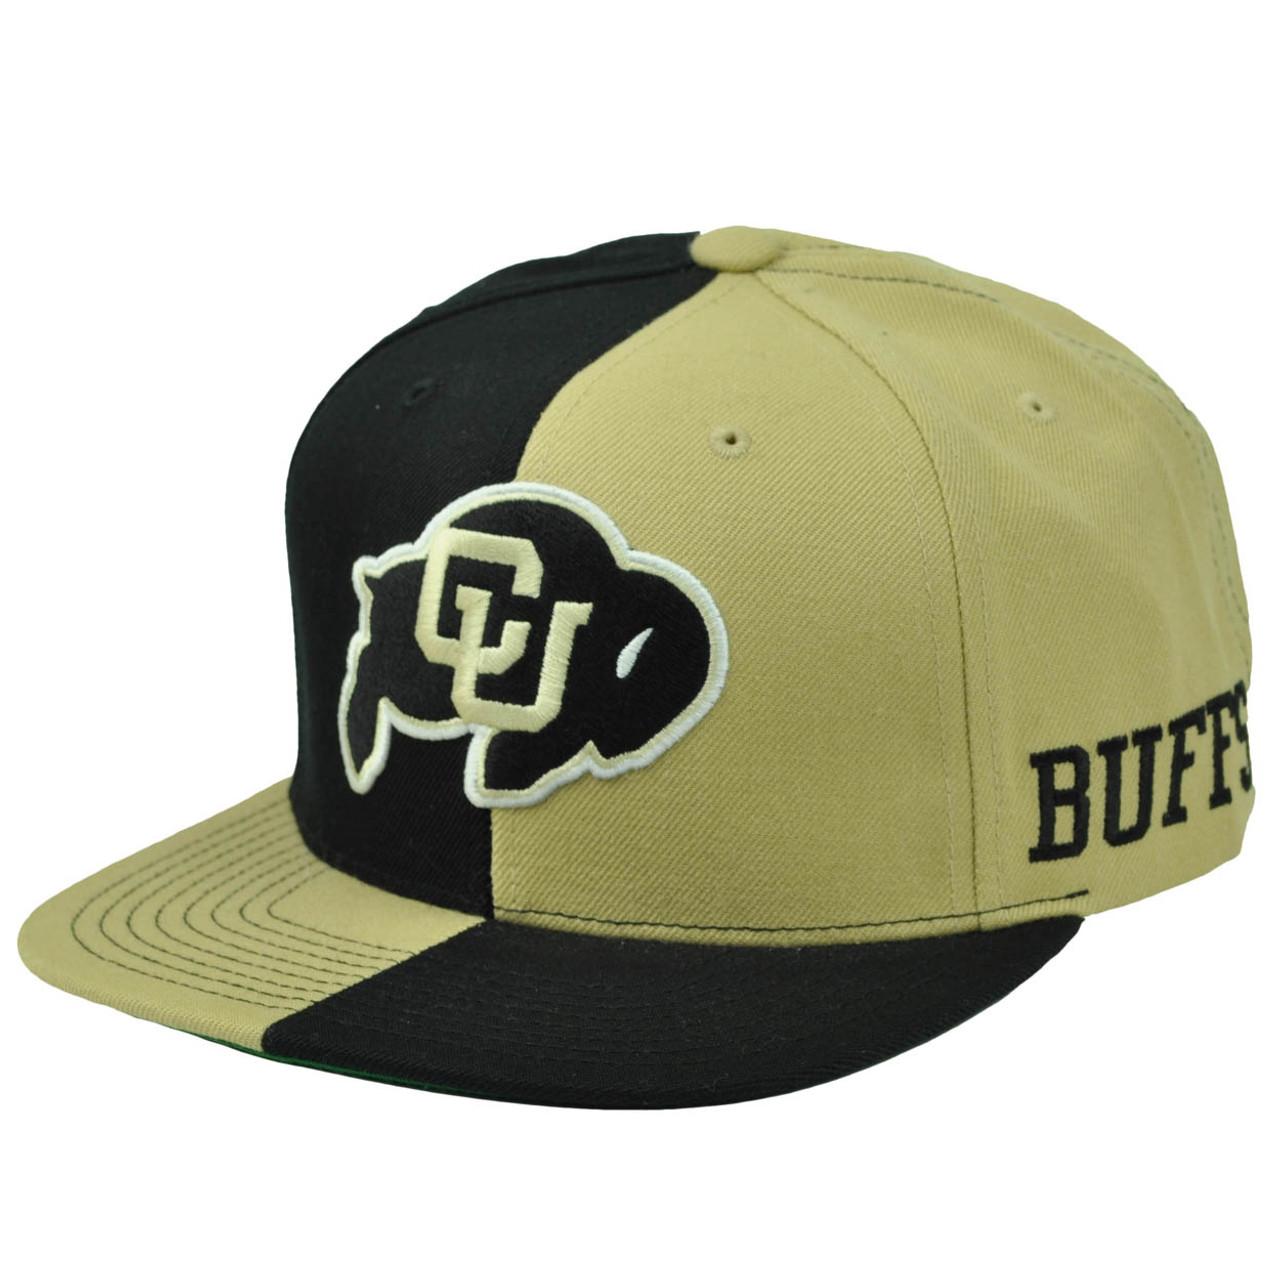 big sale 5f86e cb270 NCAA Starter Colorado Buffaloes Split Black Gold Hat Cap Snapback Flat Bill  - Cap Store Online.com